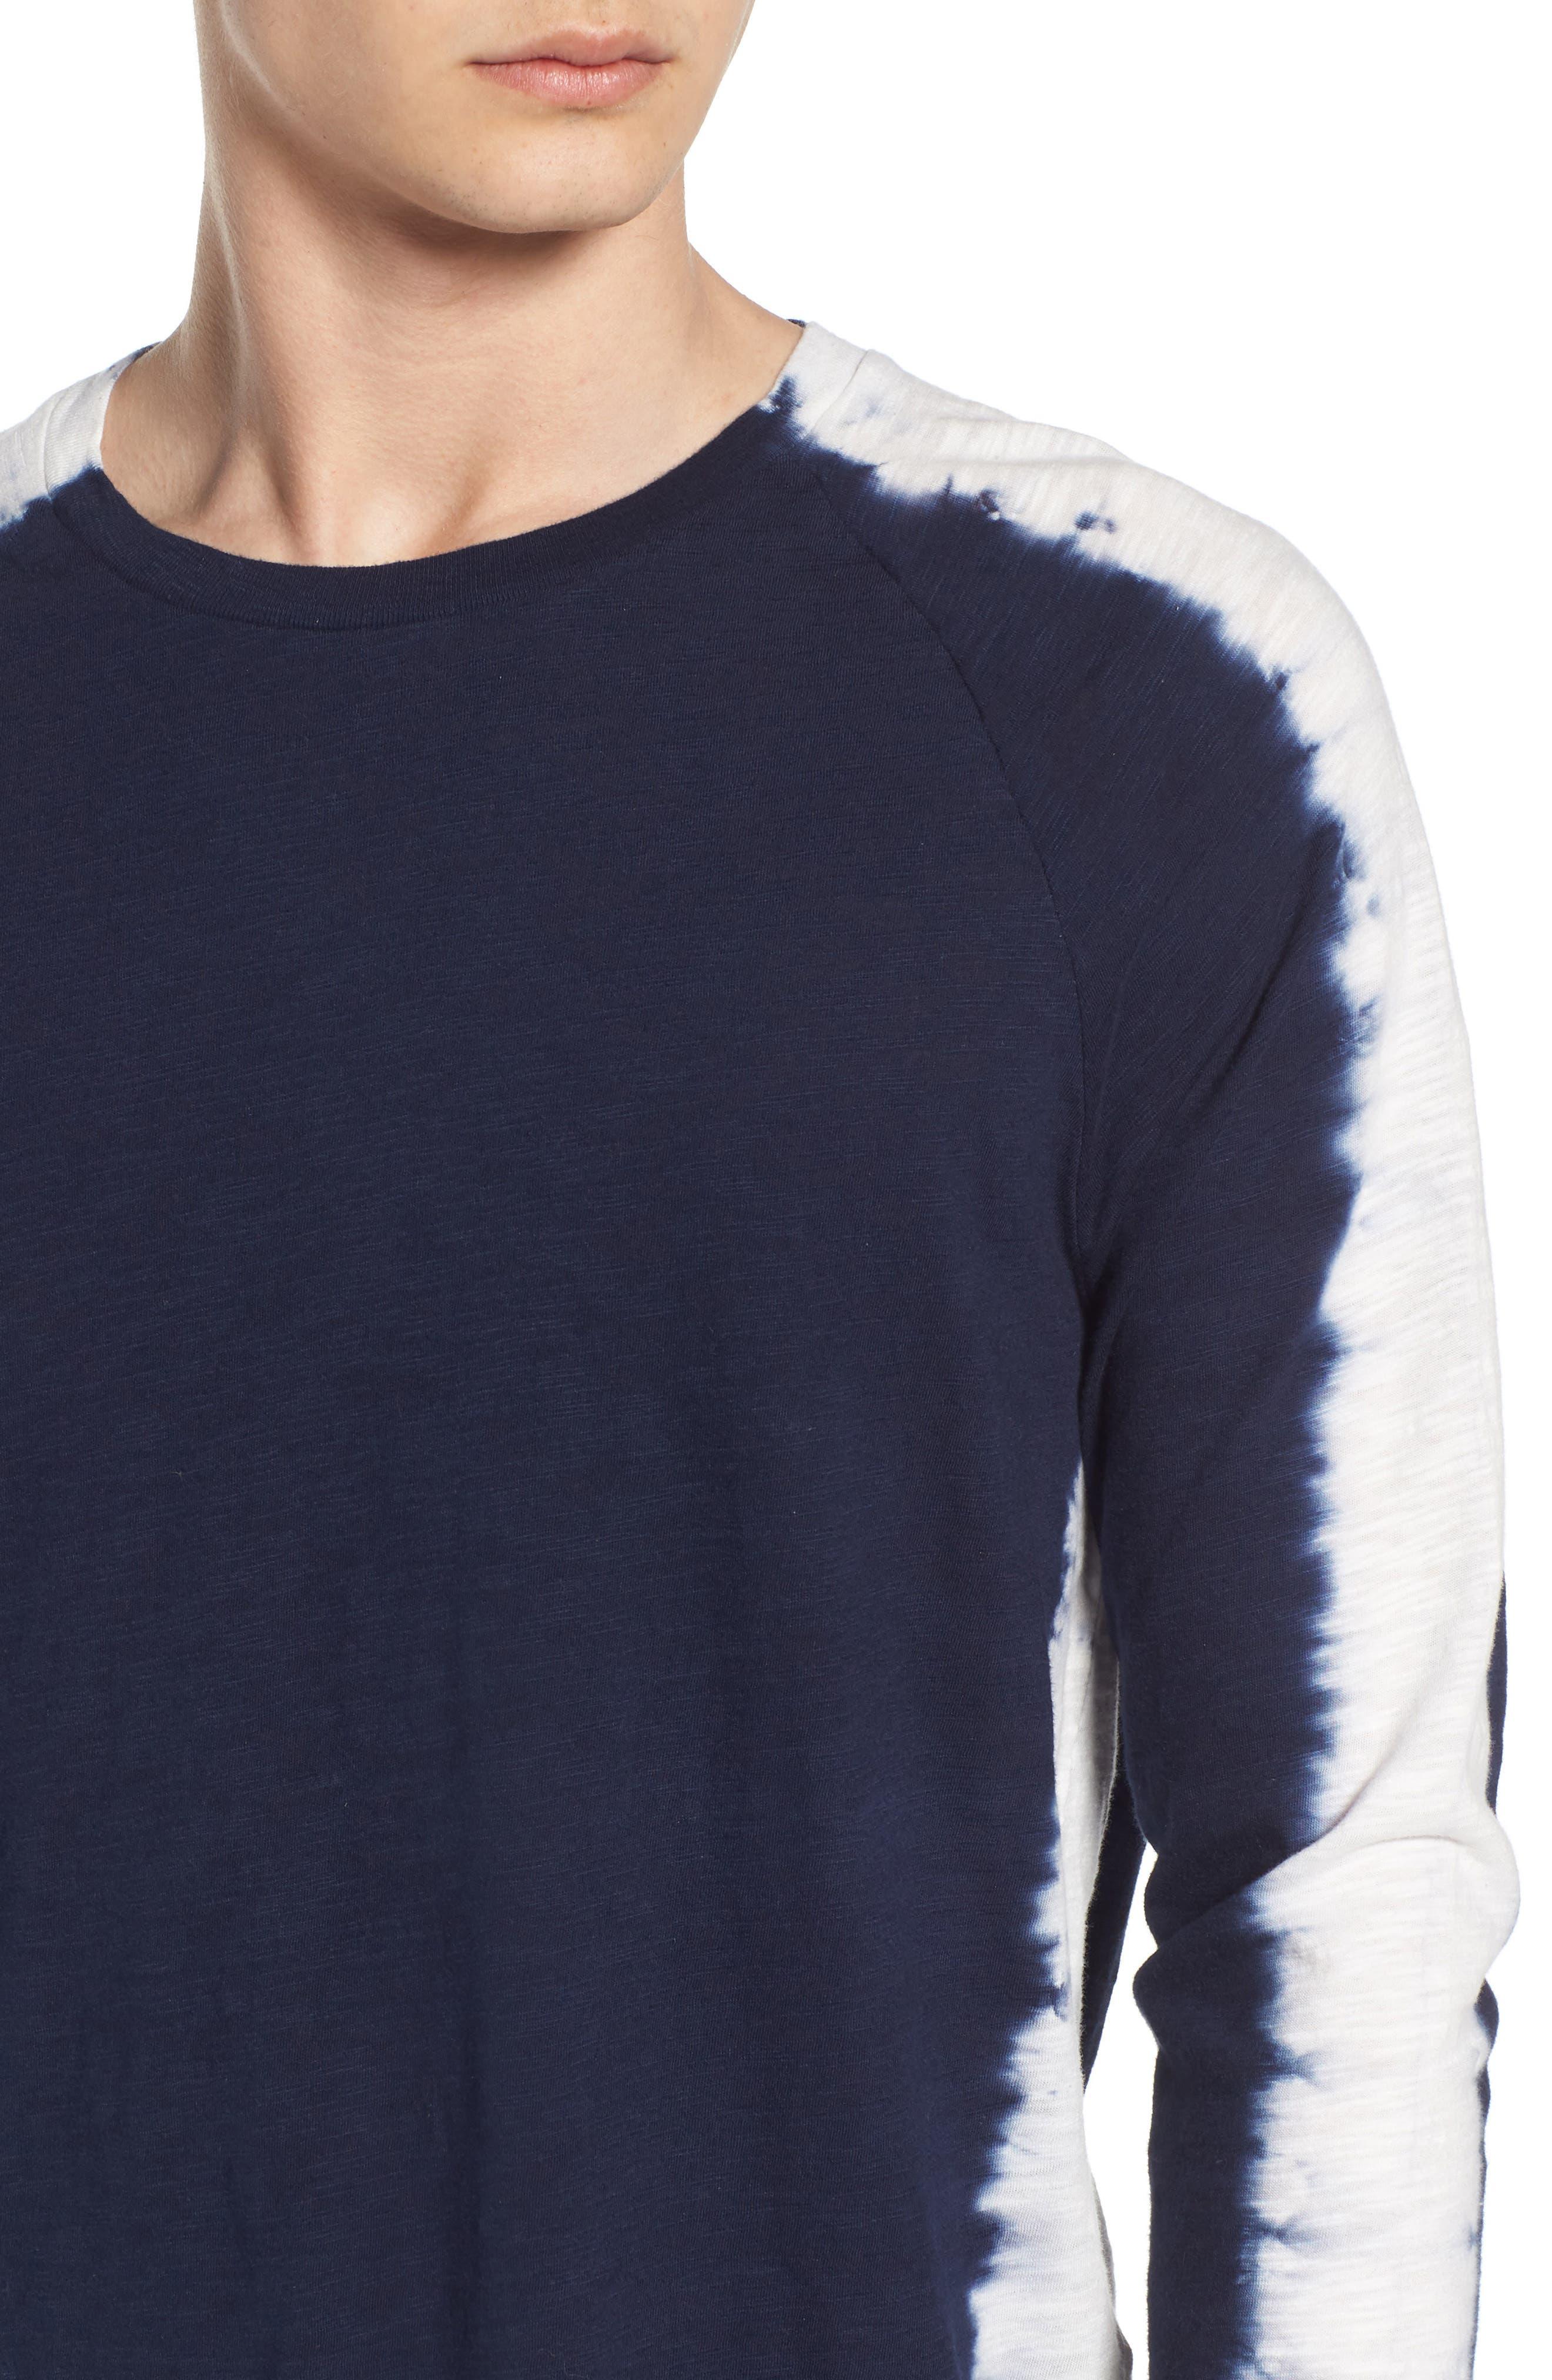 Raglan T-Shirt,                             Alternate thumbnail 4, color,                             Indigo Stripe Shibori Indigo